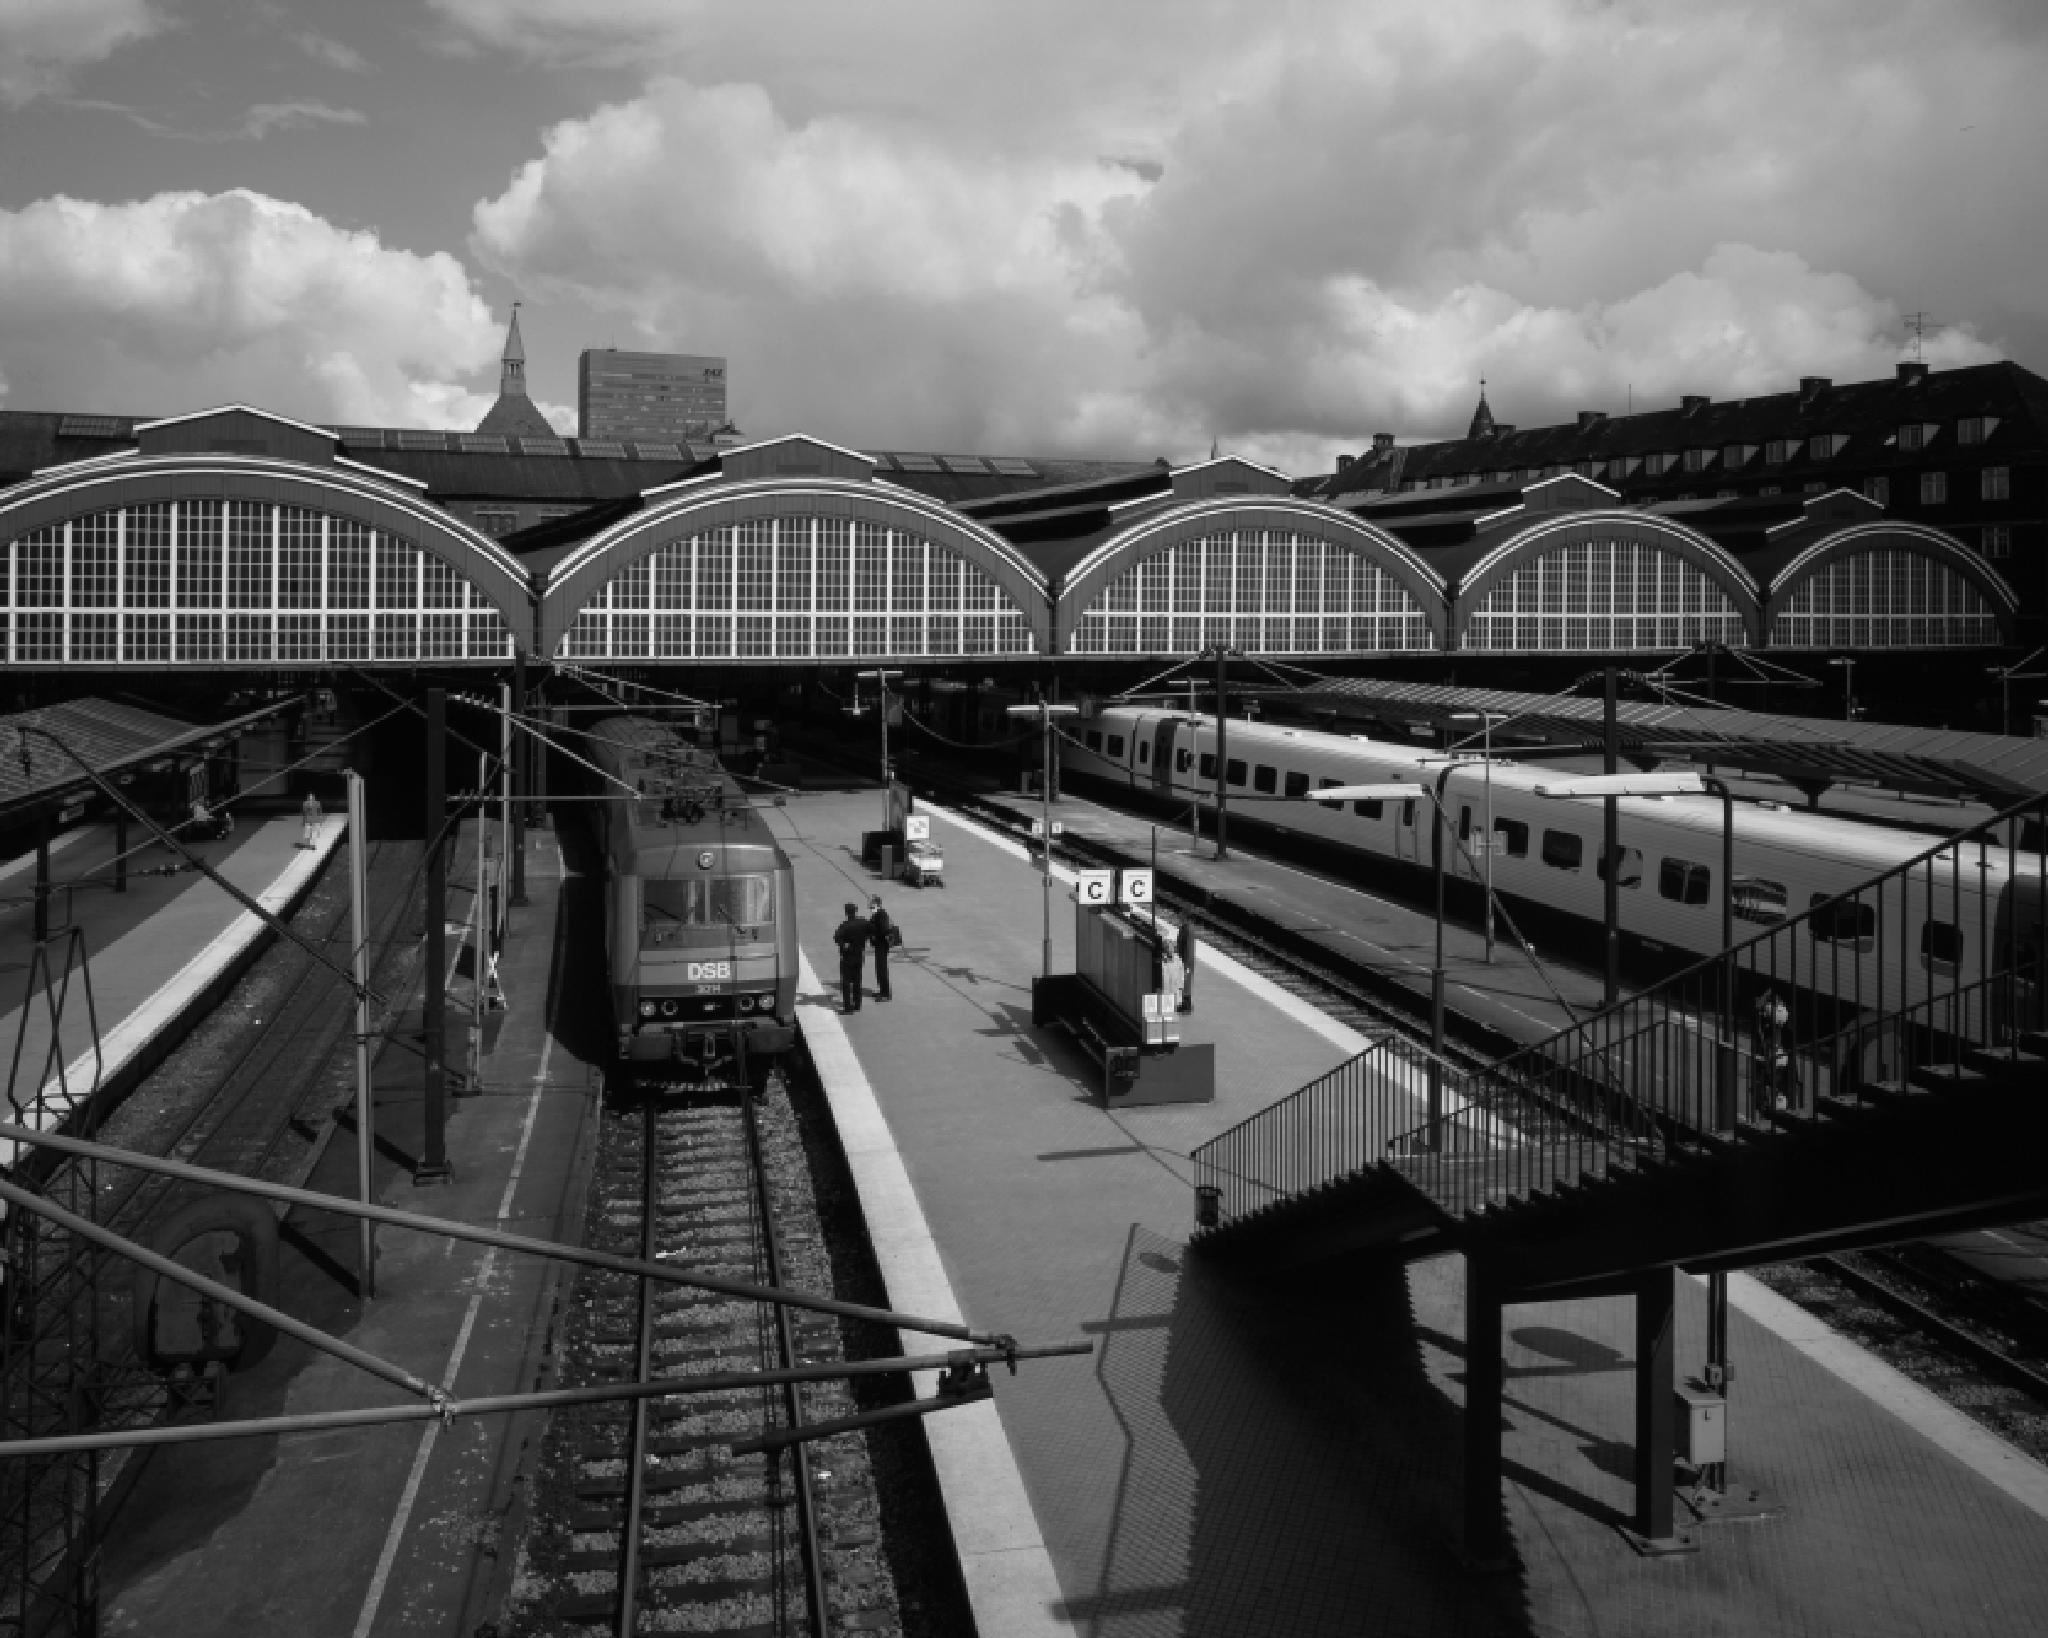 Rail way Station by Masaharu Uemura